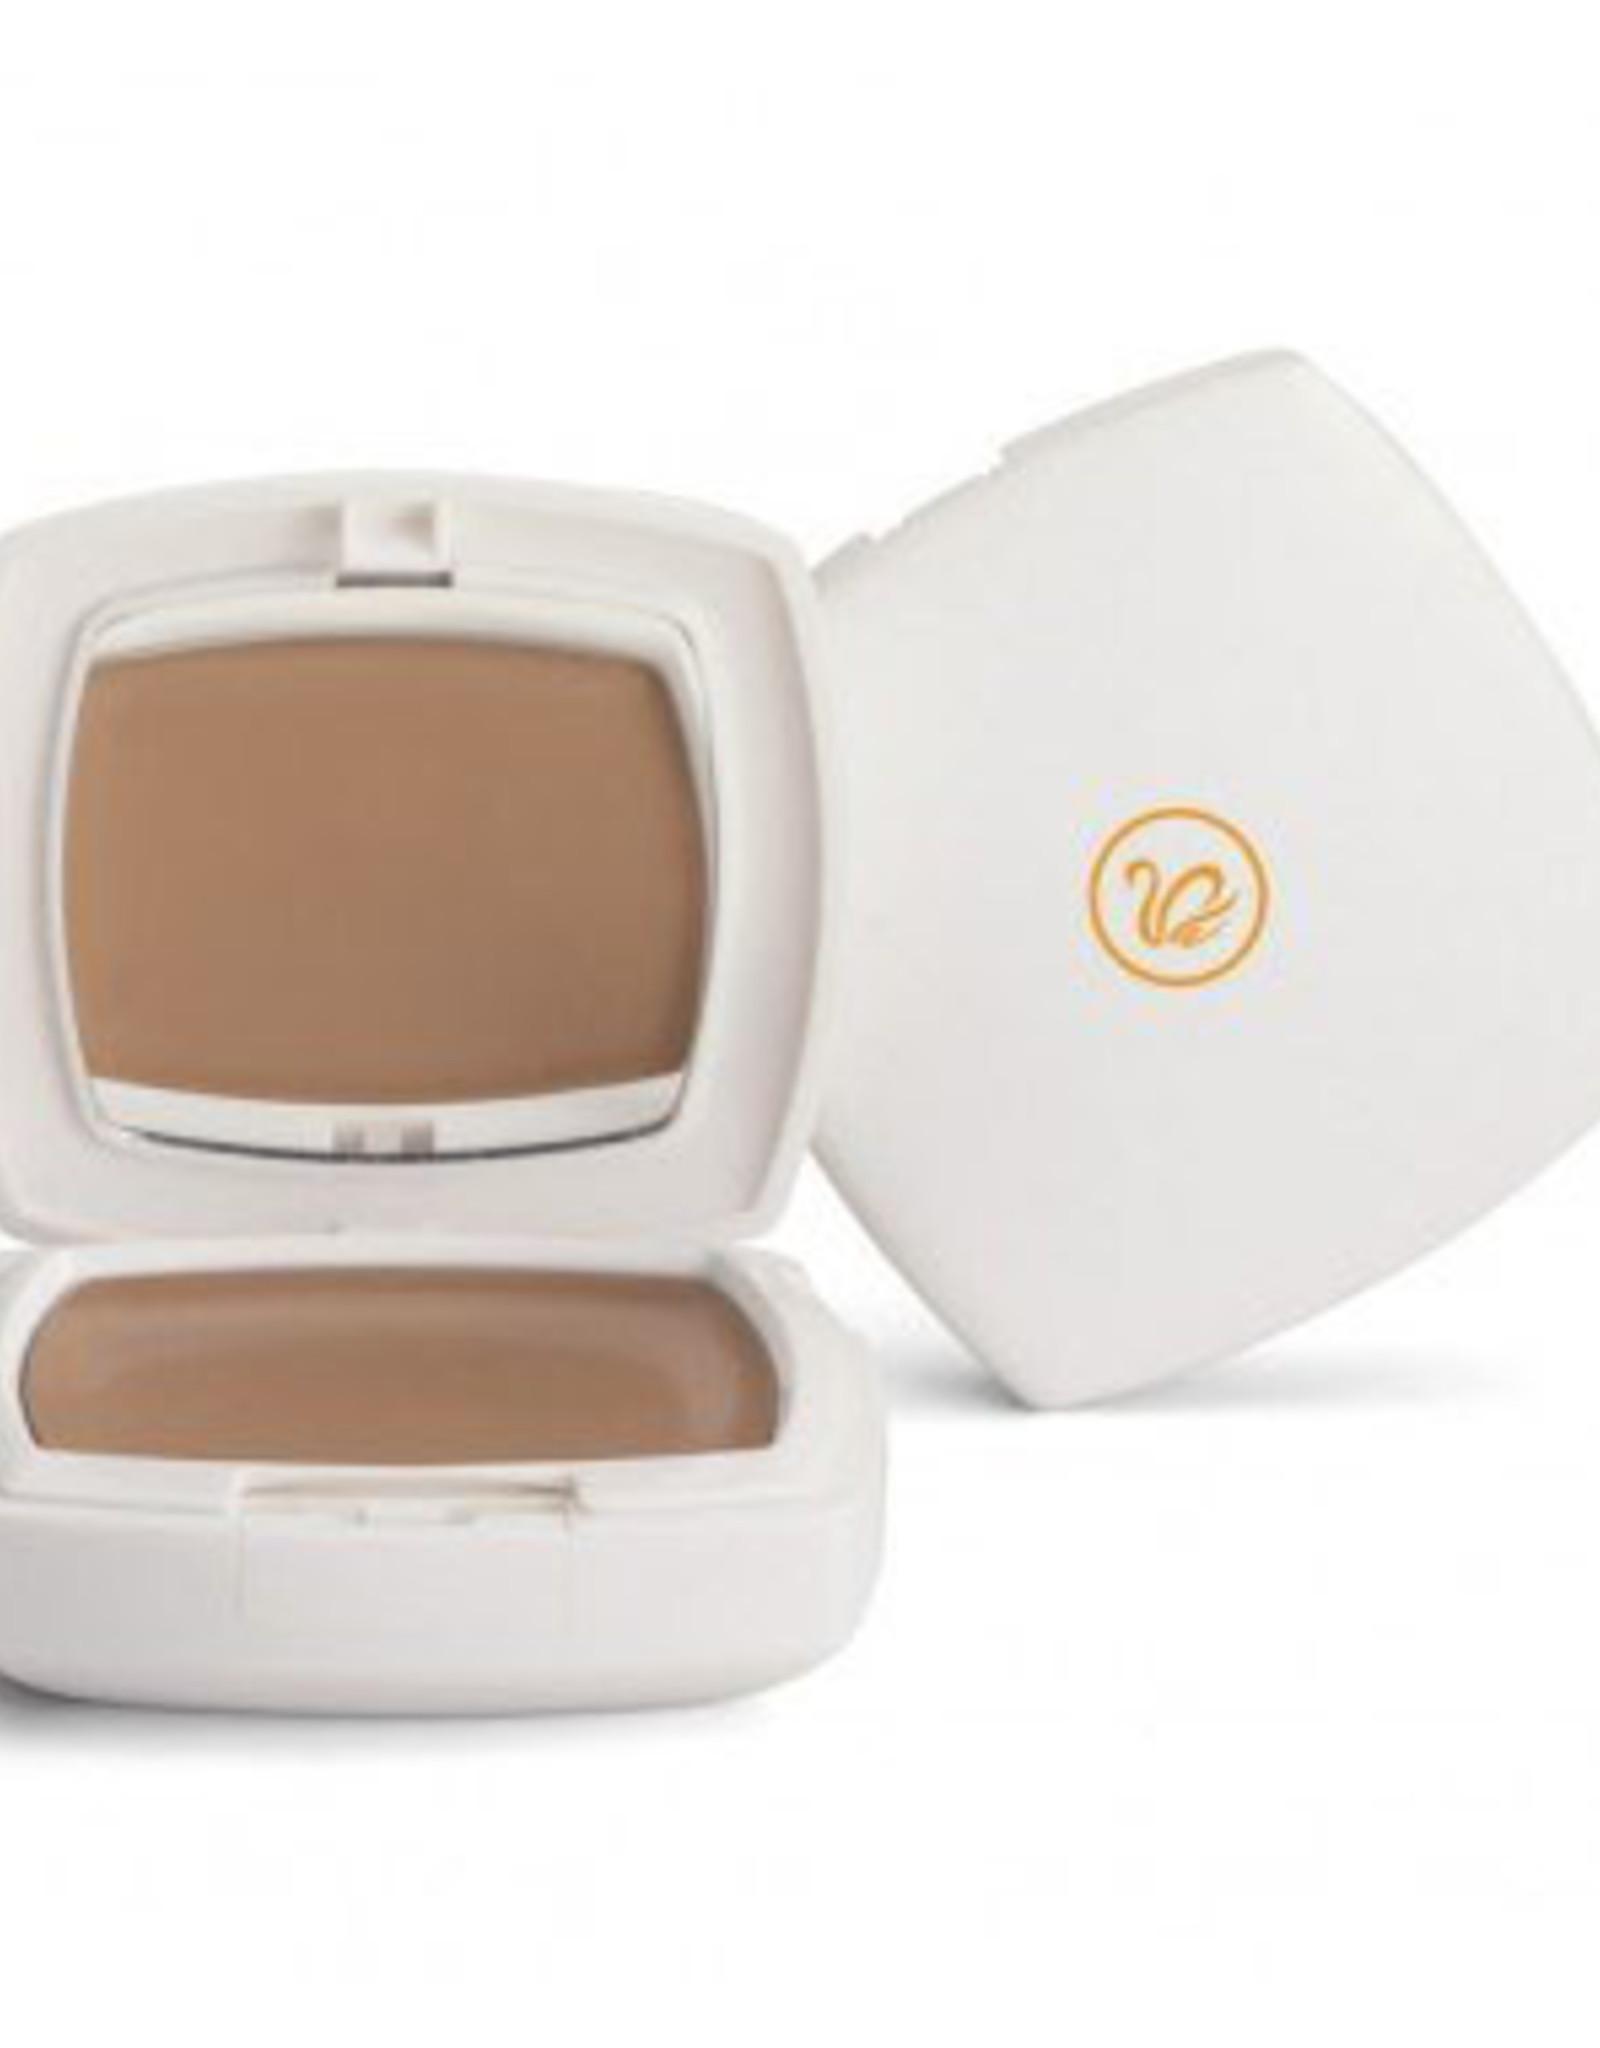 Germaine de Cappucini Hi-Protection Make-Up Bronze SPF 50